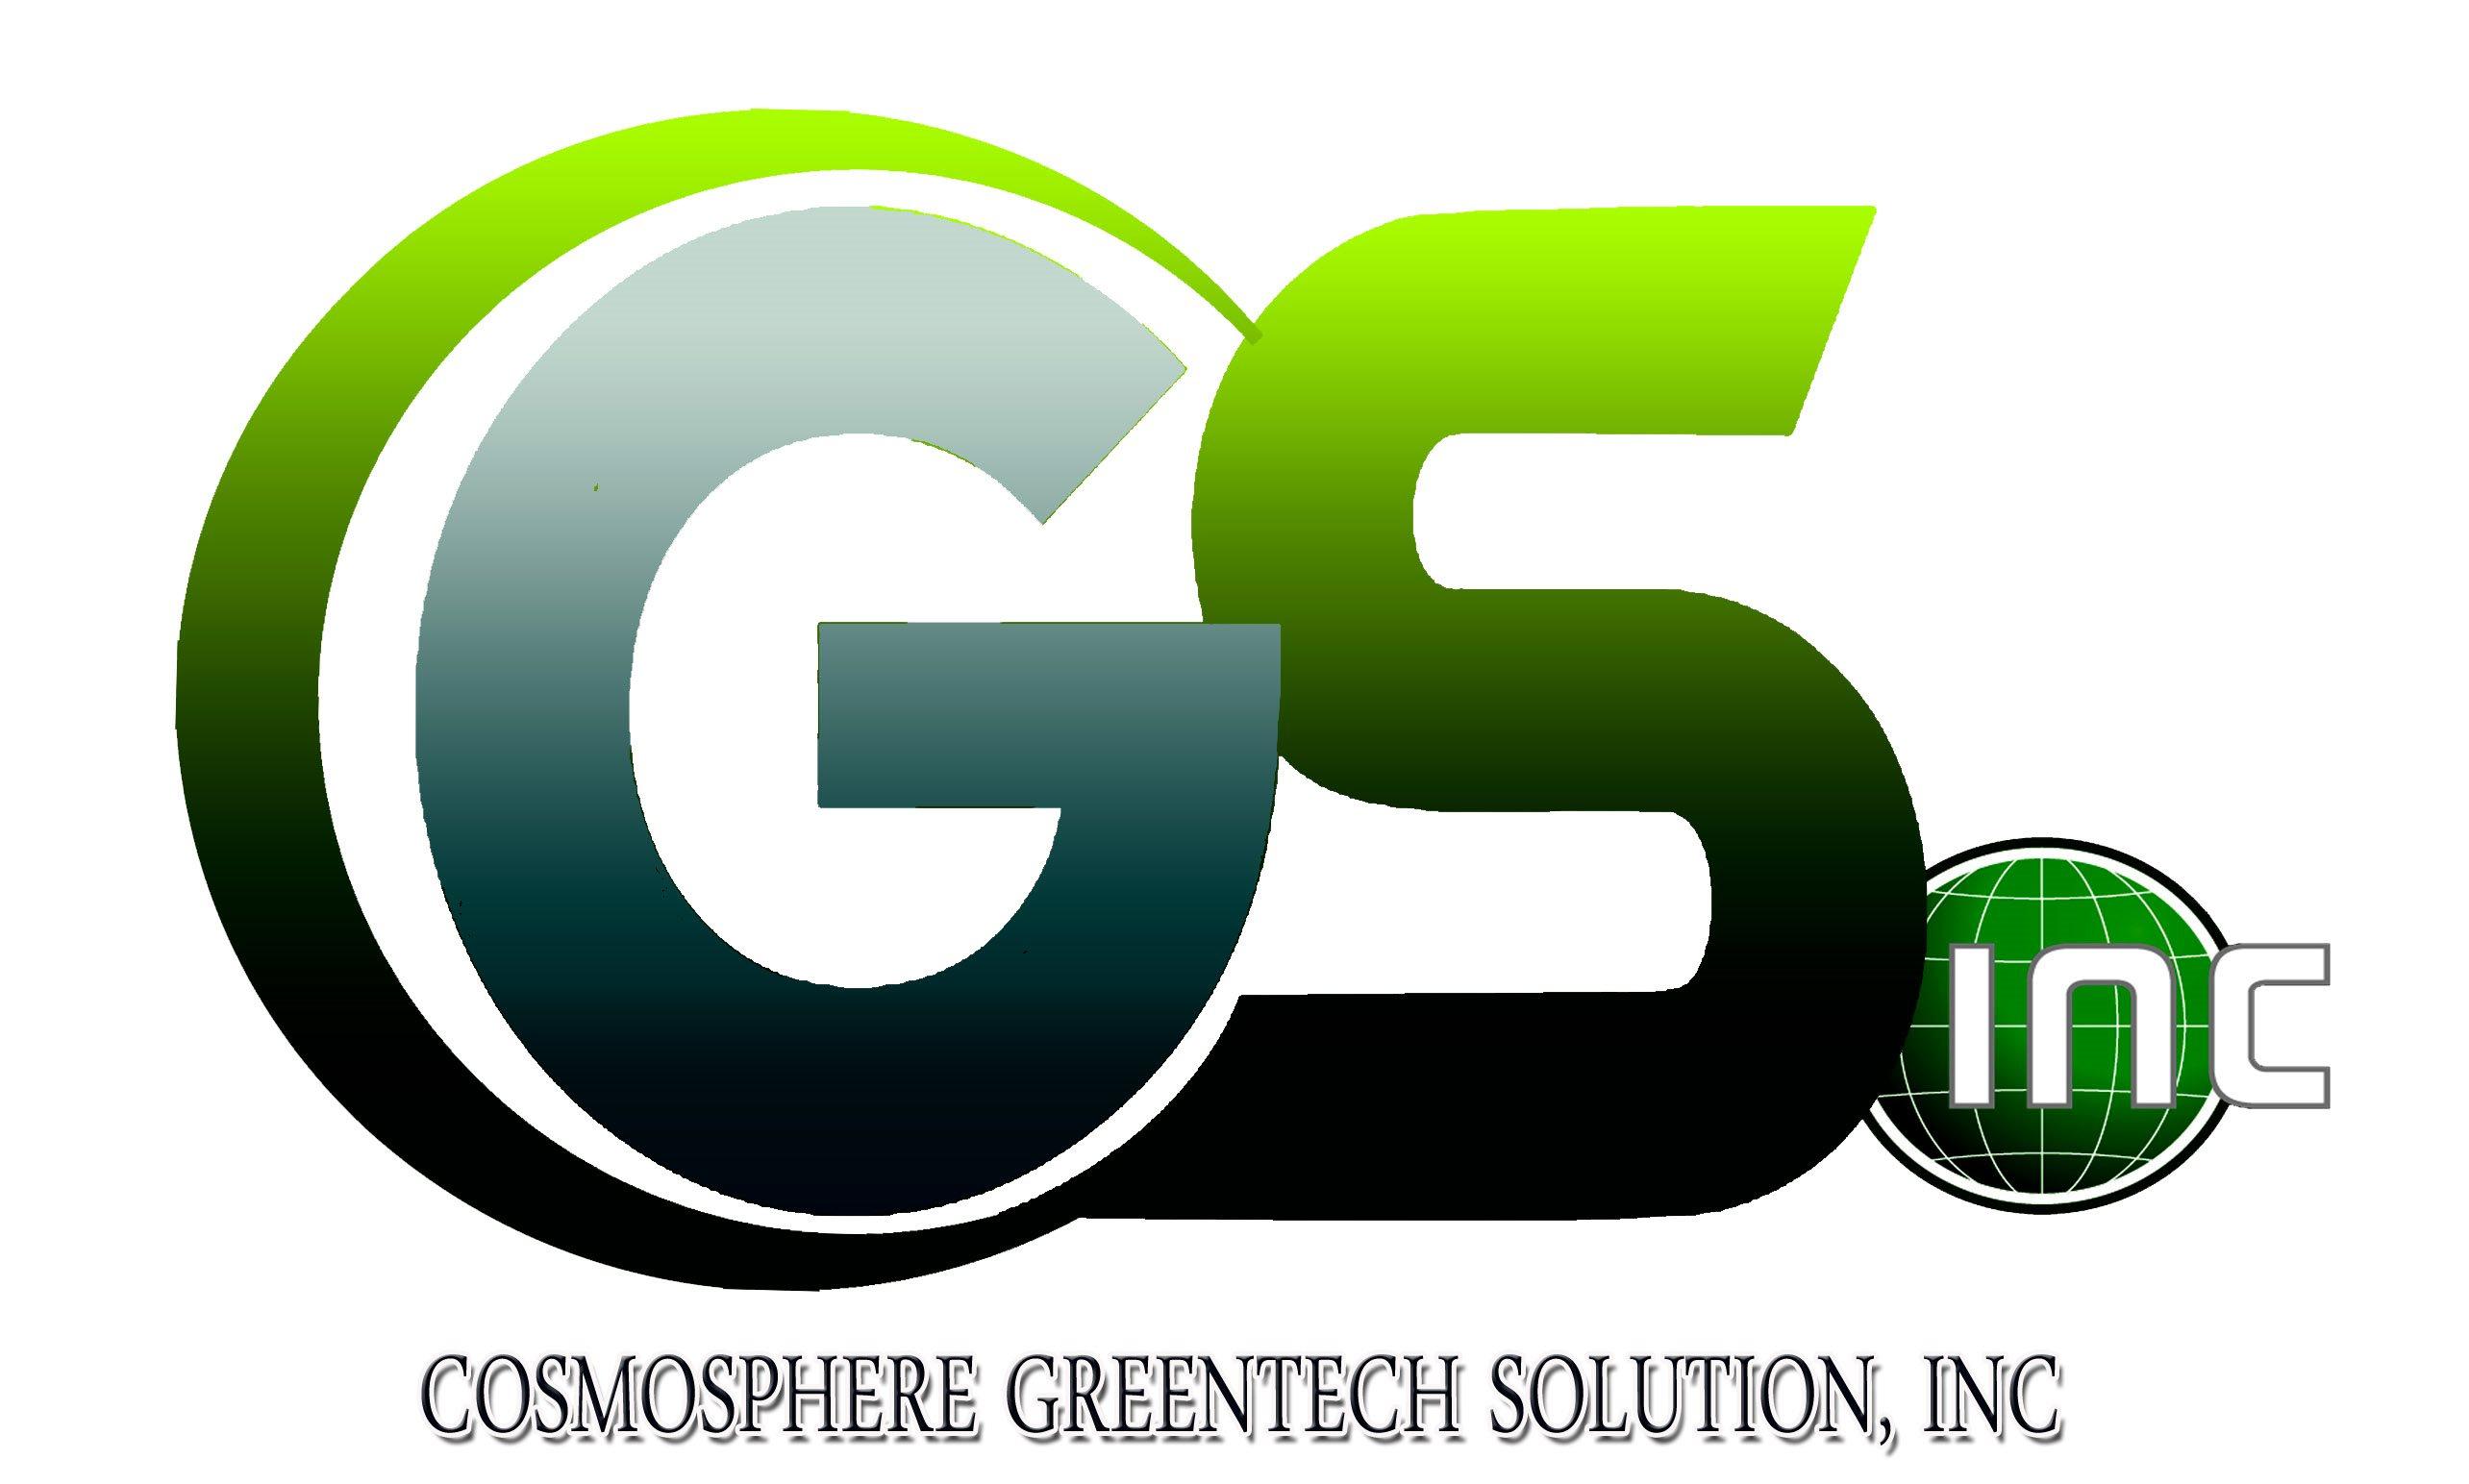 Cosmosphere Greentech Solution Inc.